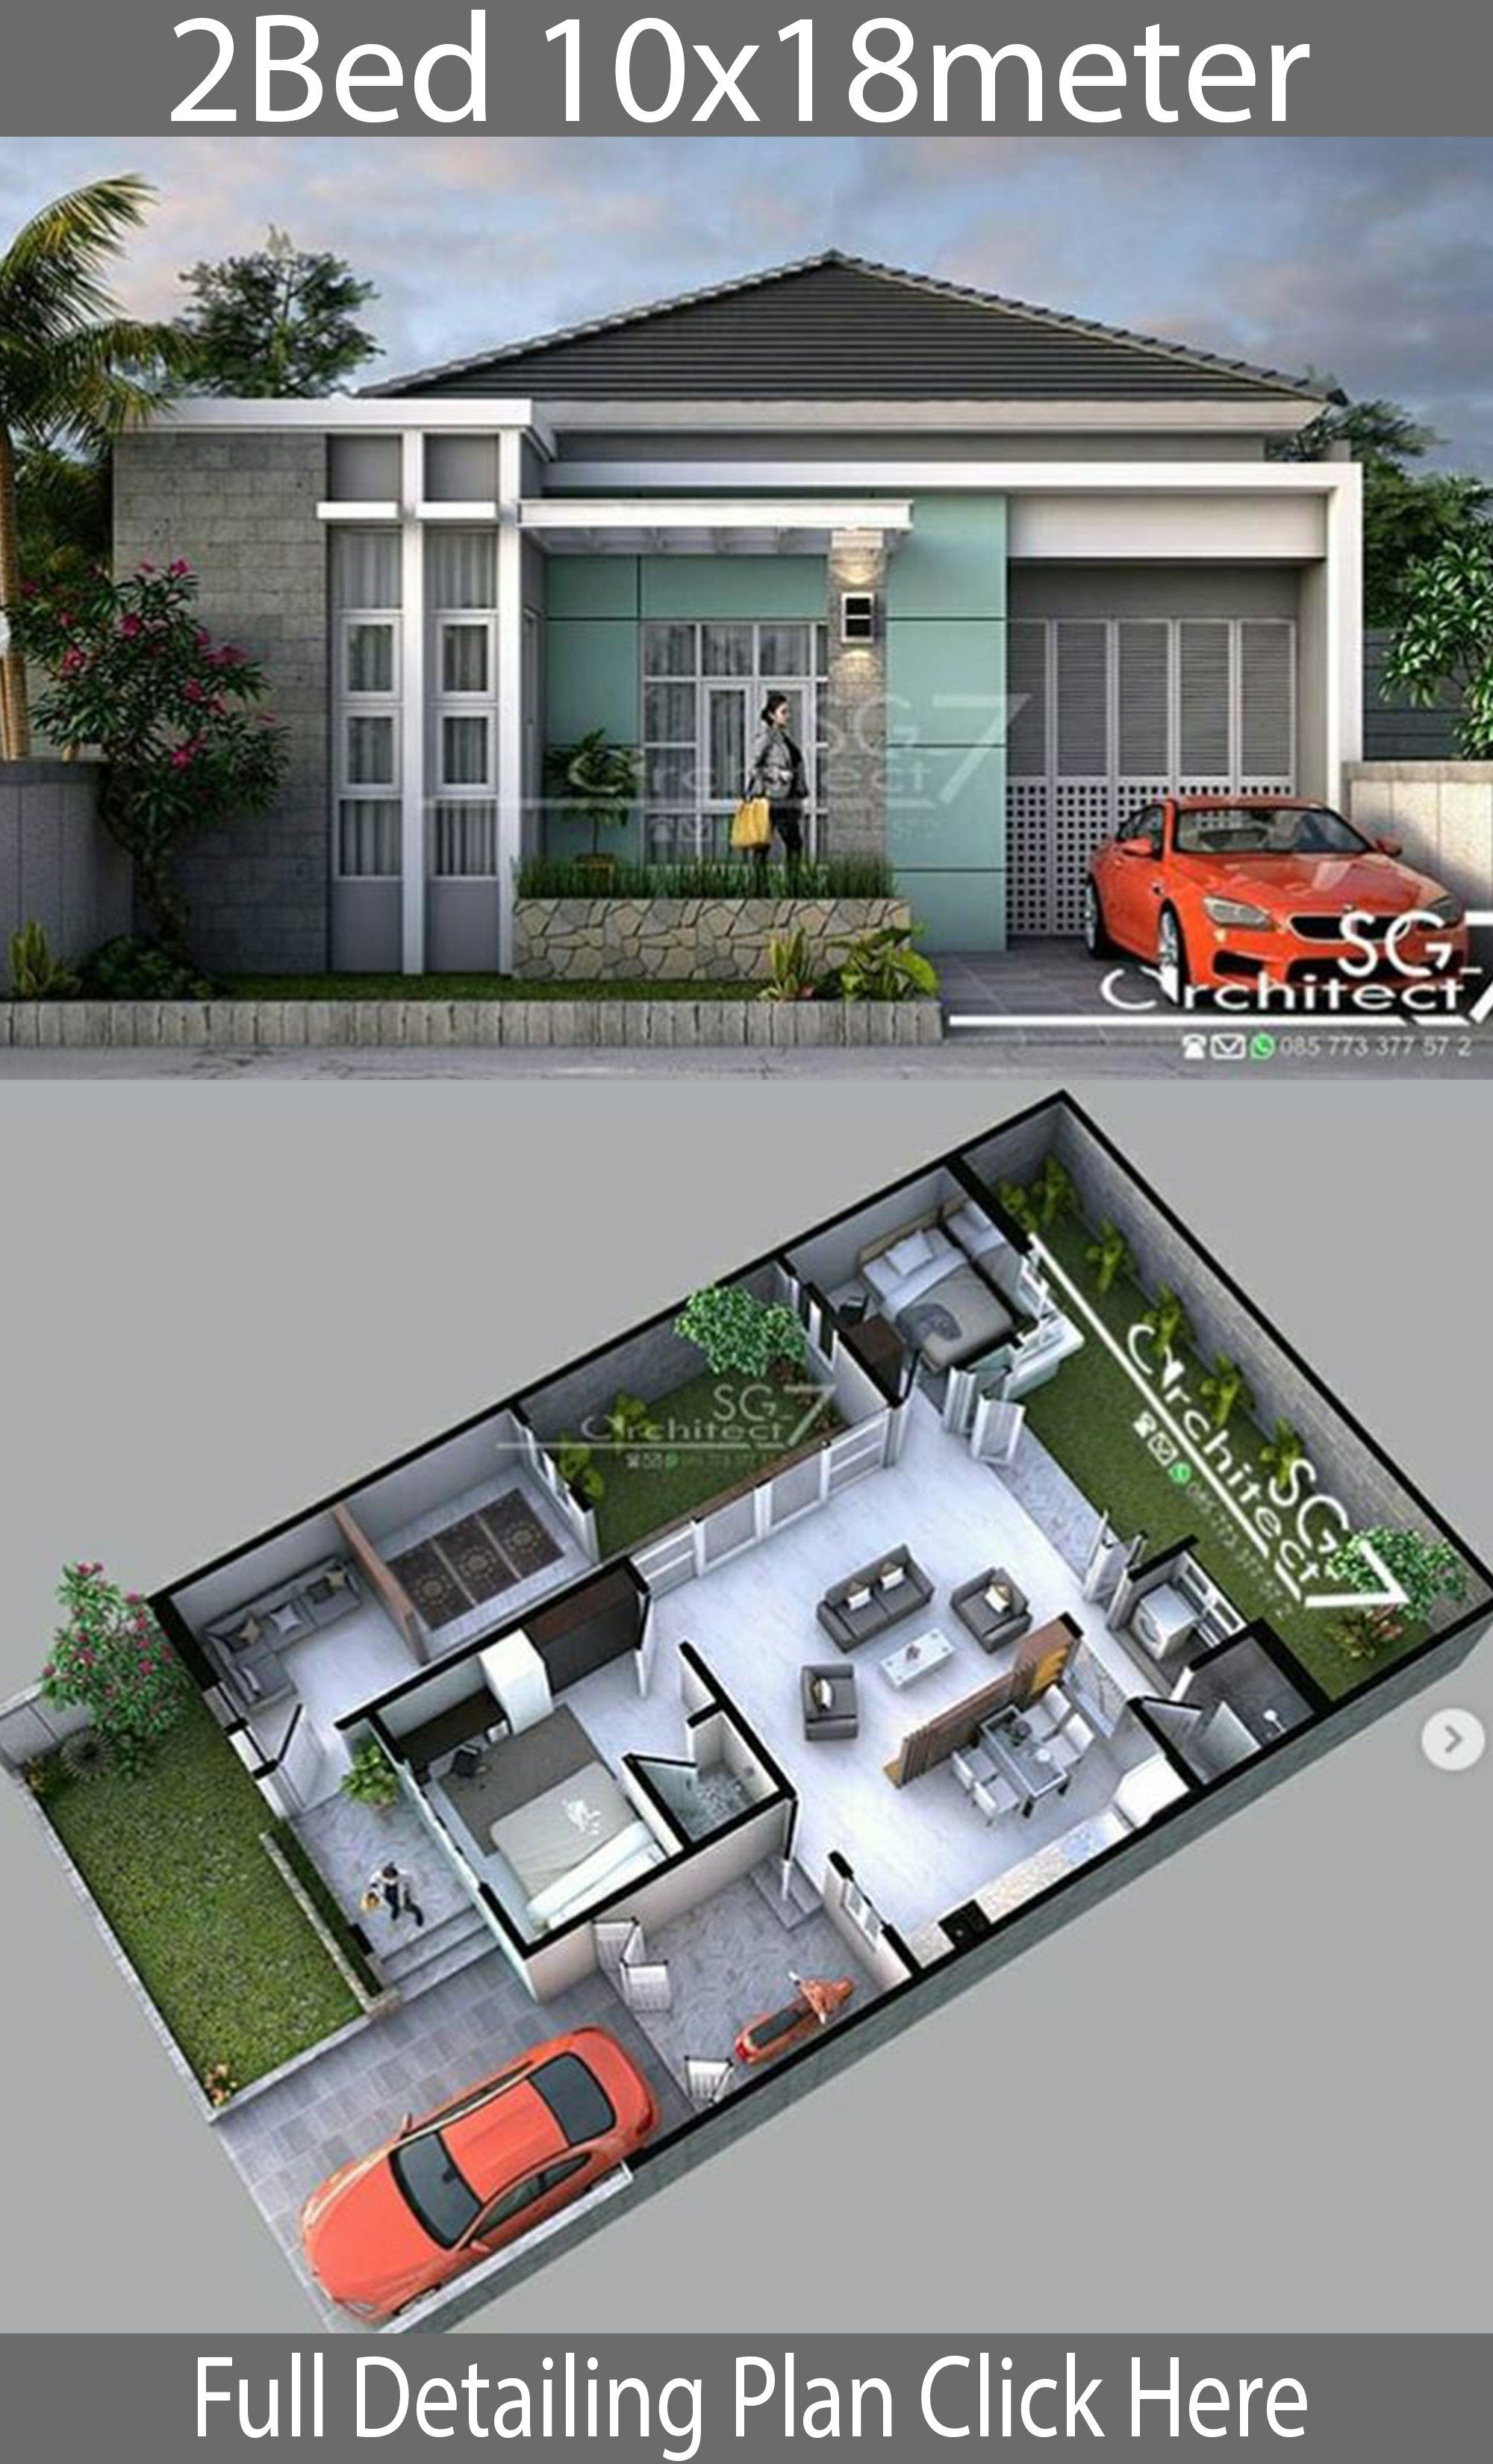 2 Bedrooms Home Design Plan 10x18m House Description One Car Parking And Small House Design Architecture Small House Design Exterior House Architecture Design